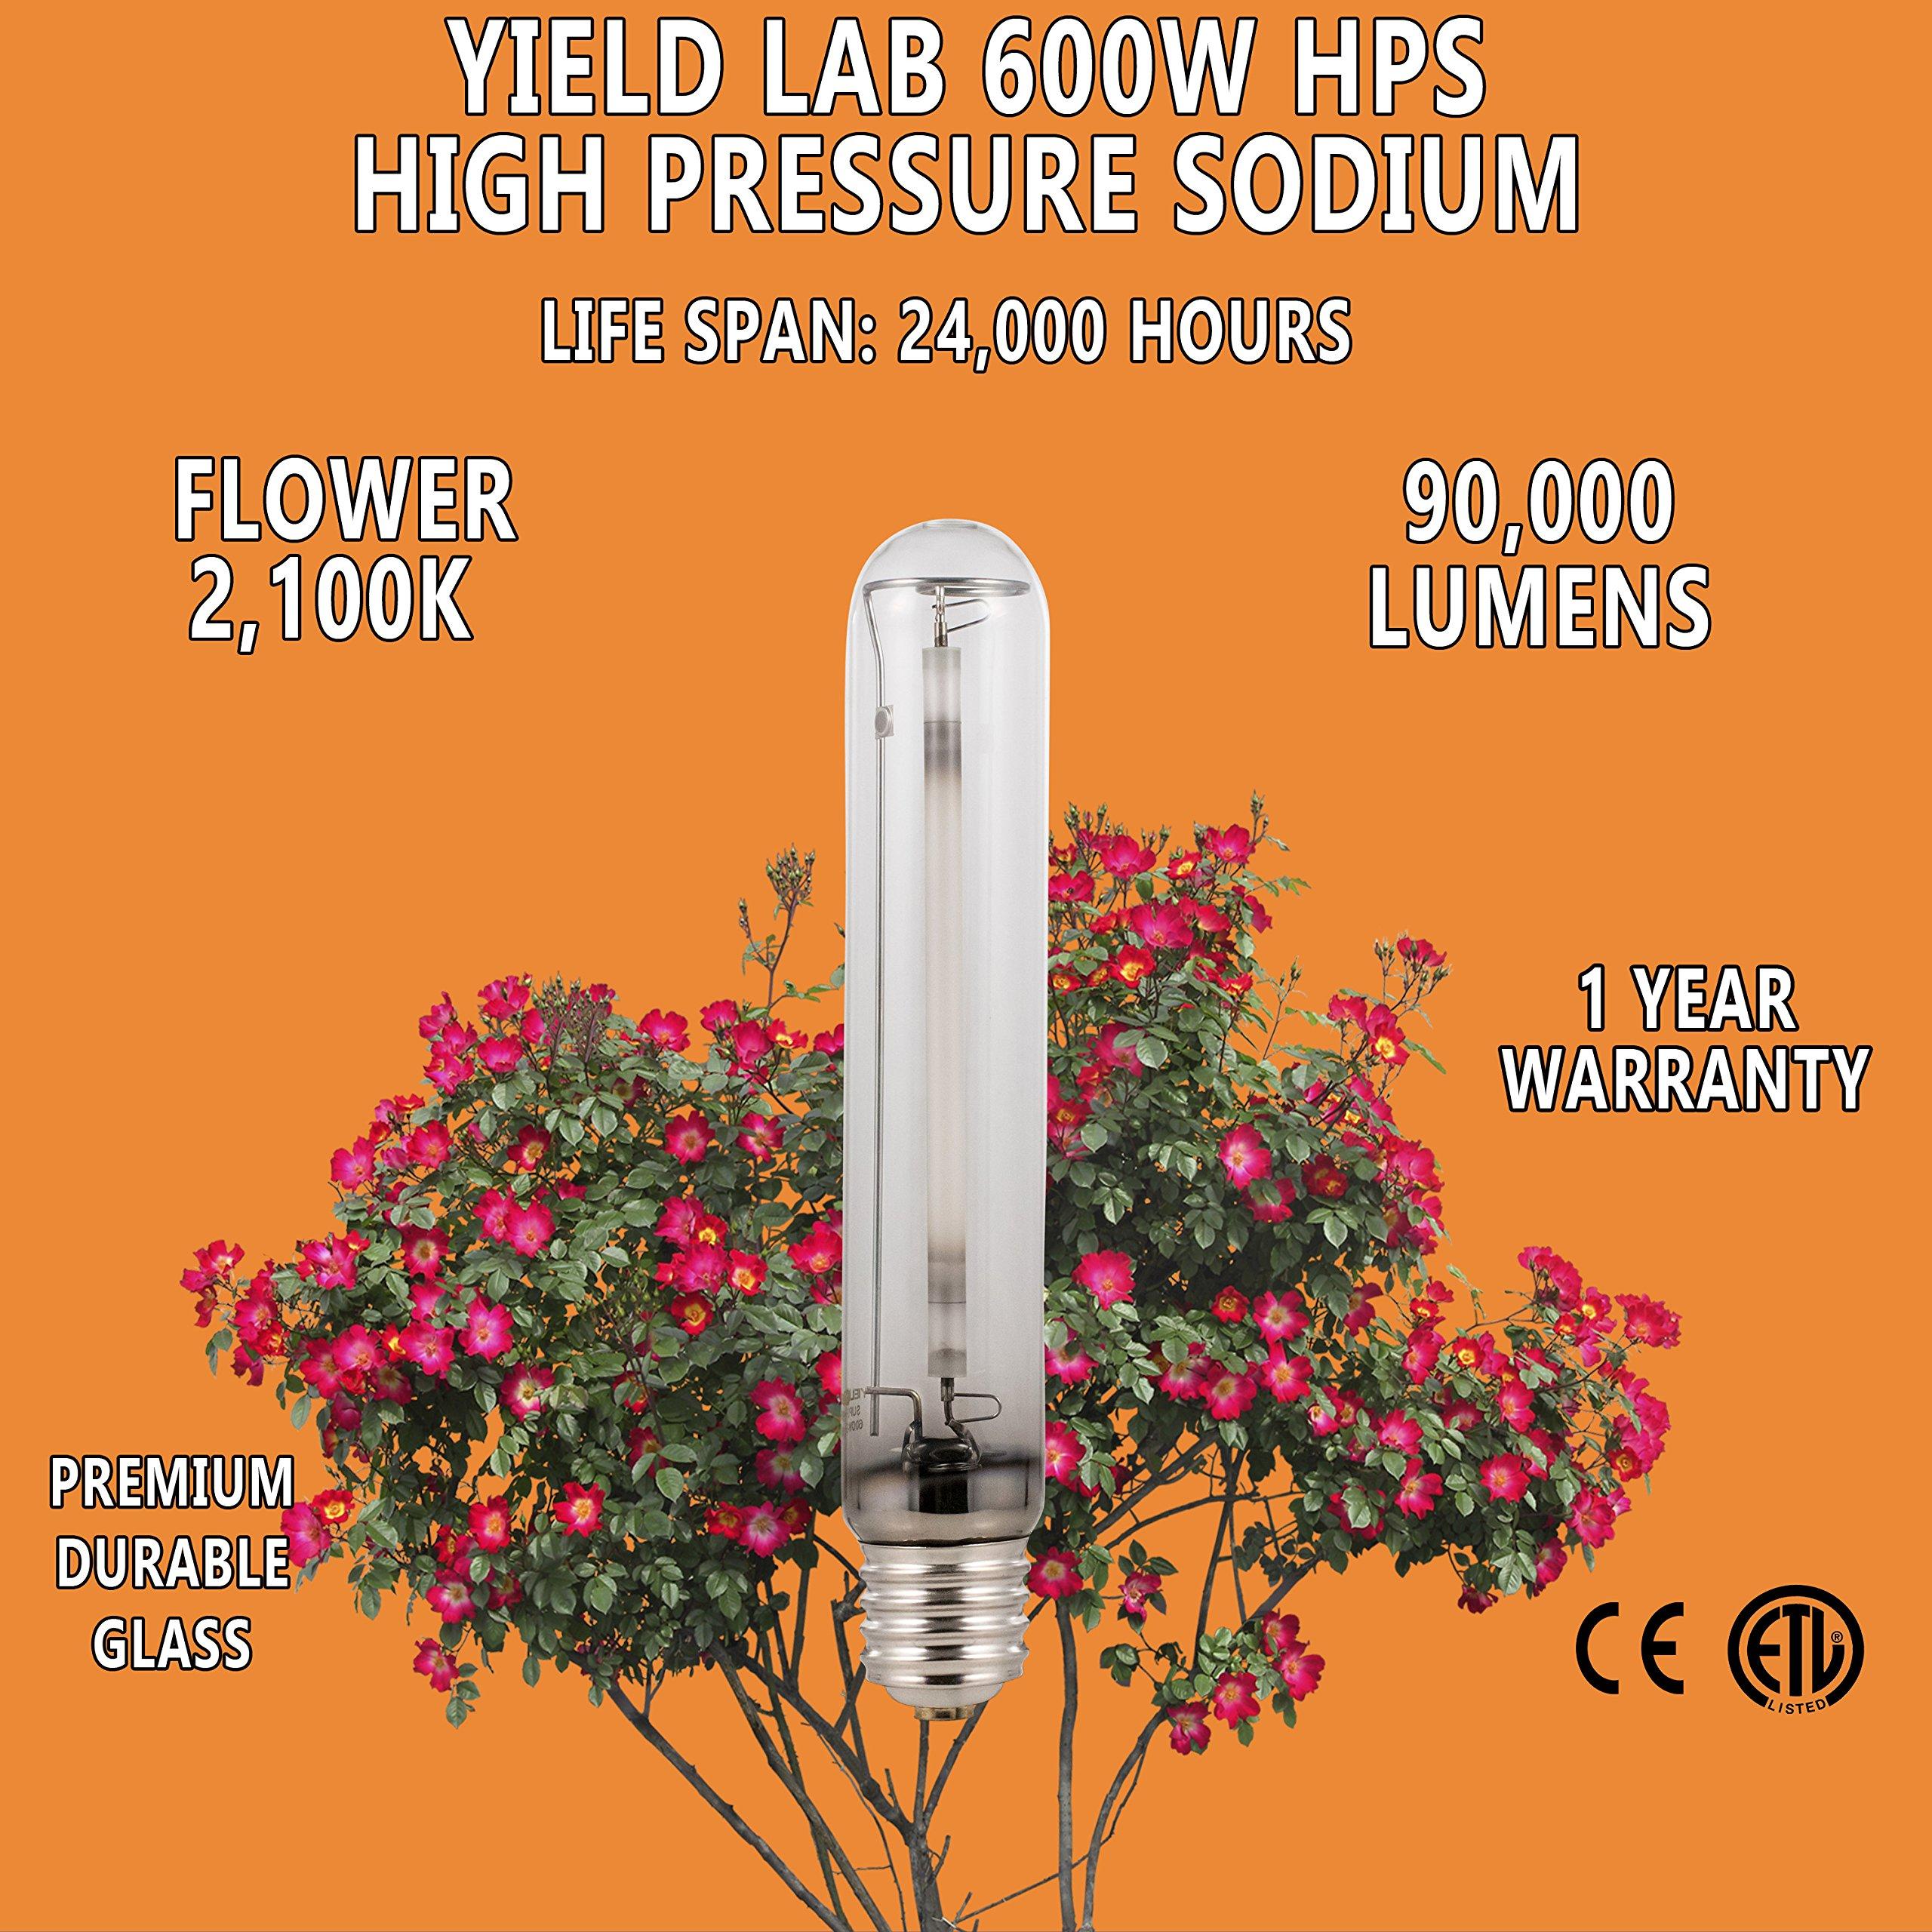 Yield Lab 600w High Pressure Sodium (HPS) Digital HID Grow Light Bulb (2100K) – 3 Bulbs – Hydroponic, Aeroponic, Horticulture Growing Equipment by Yield Lab (Image #4)